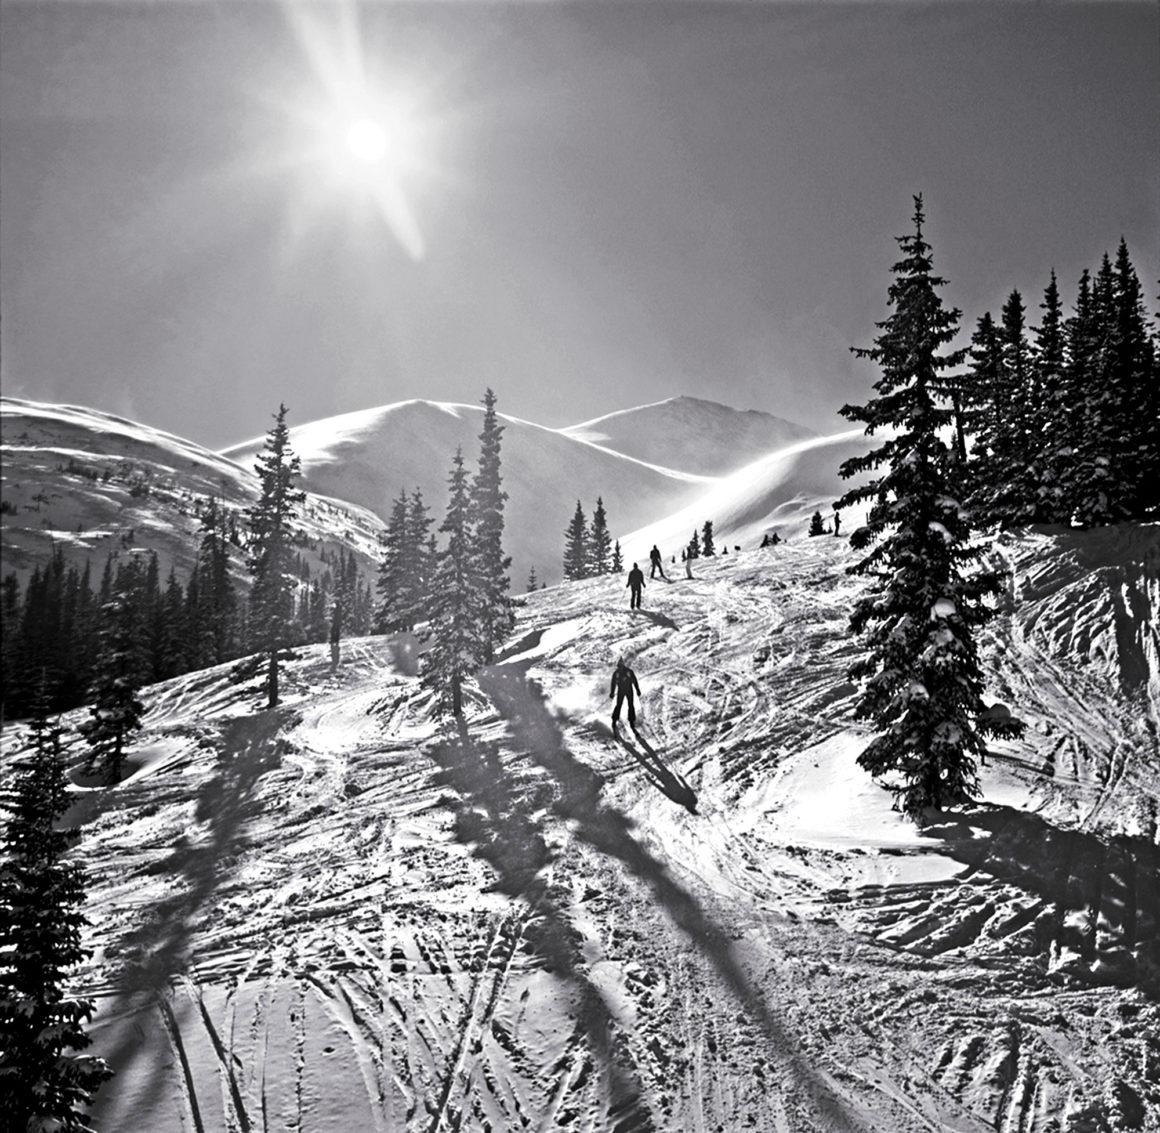 Skiers on Peak 8, Breckenridge